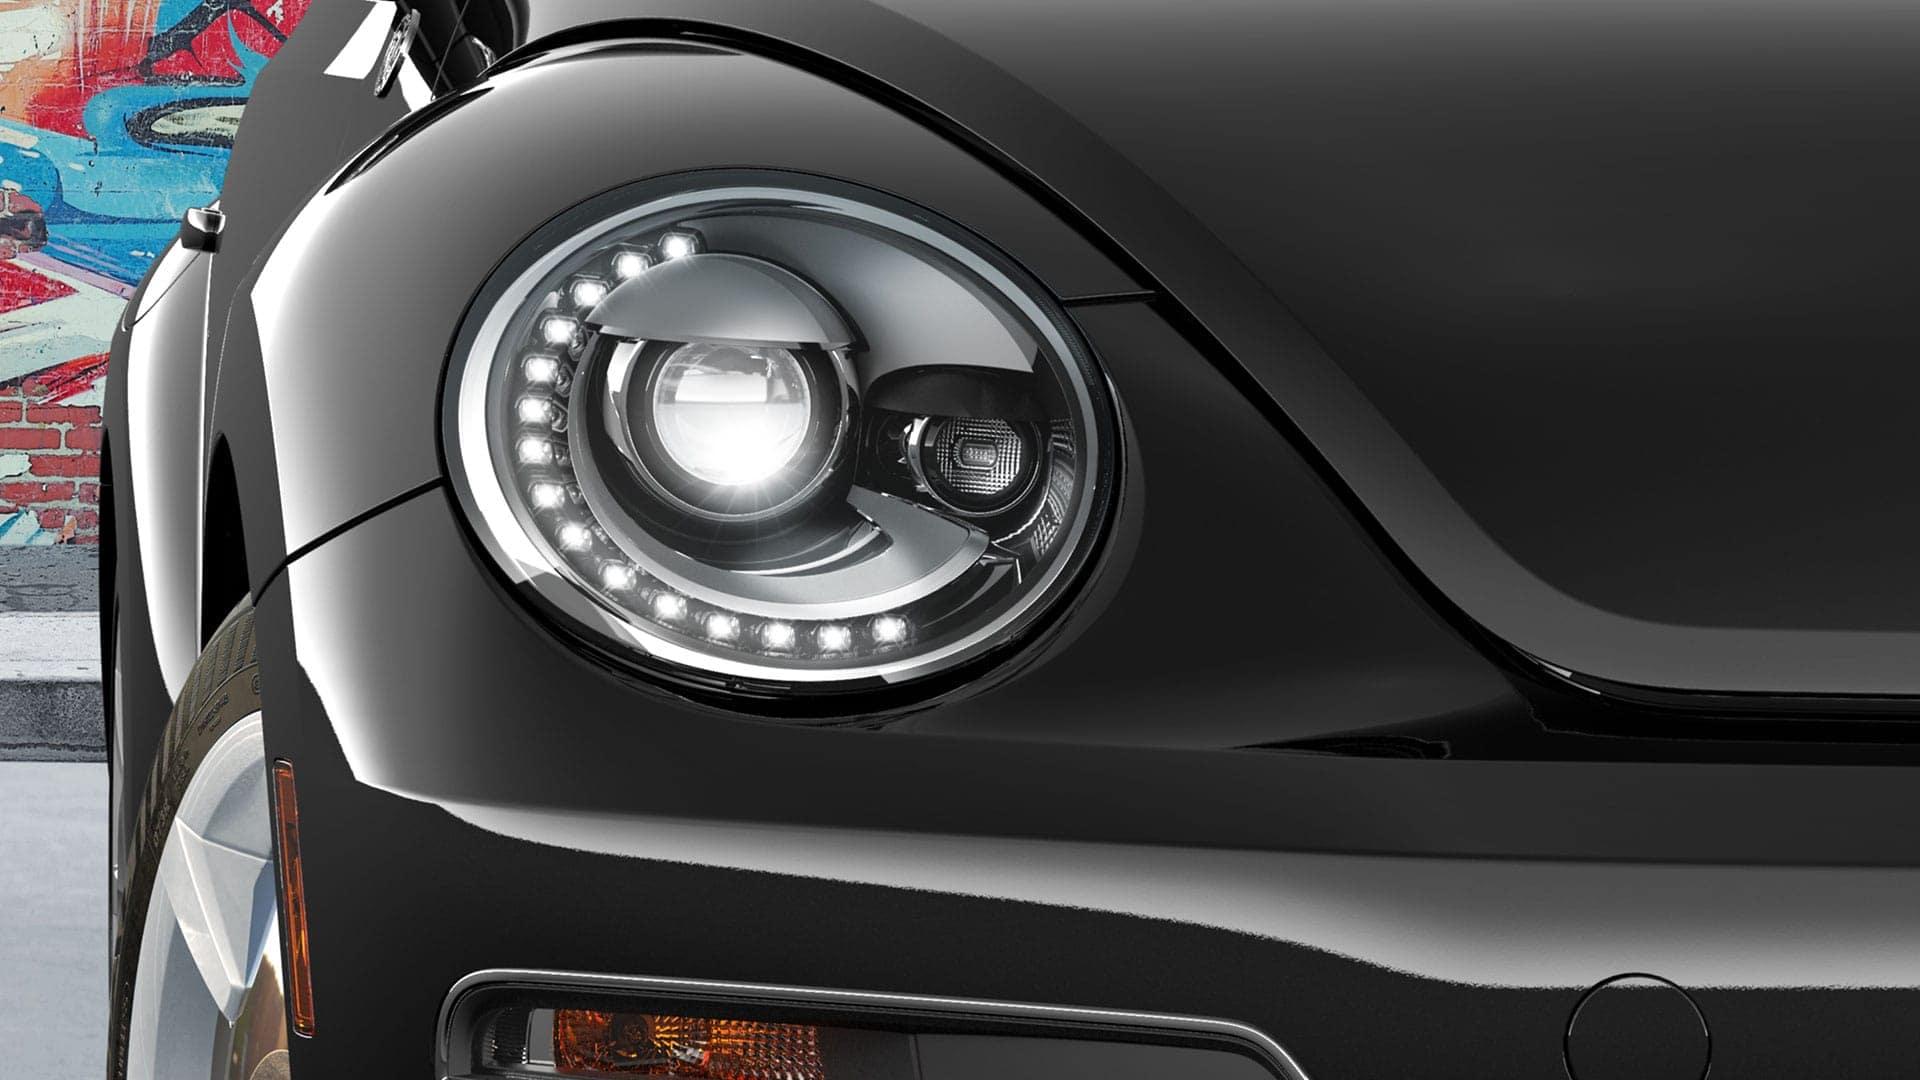 2019 VW Beetle LED lights